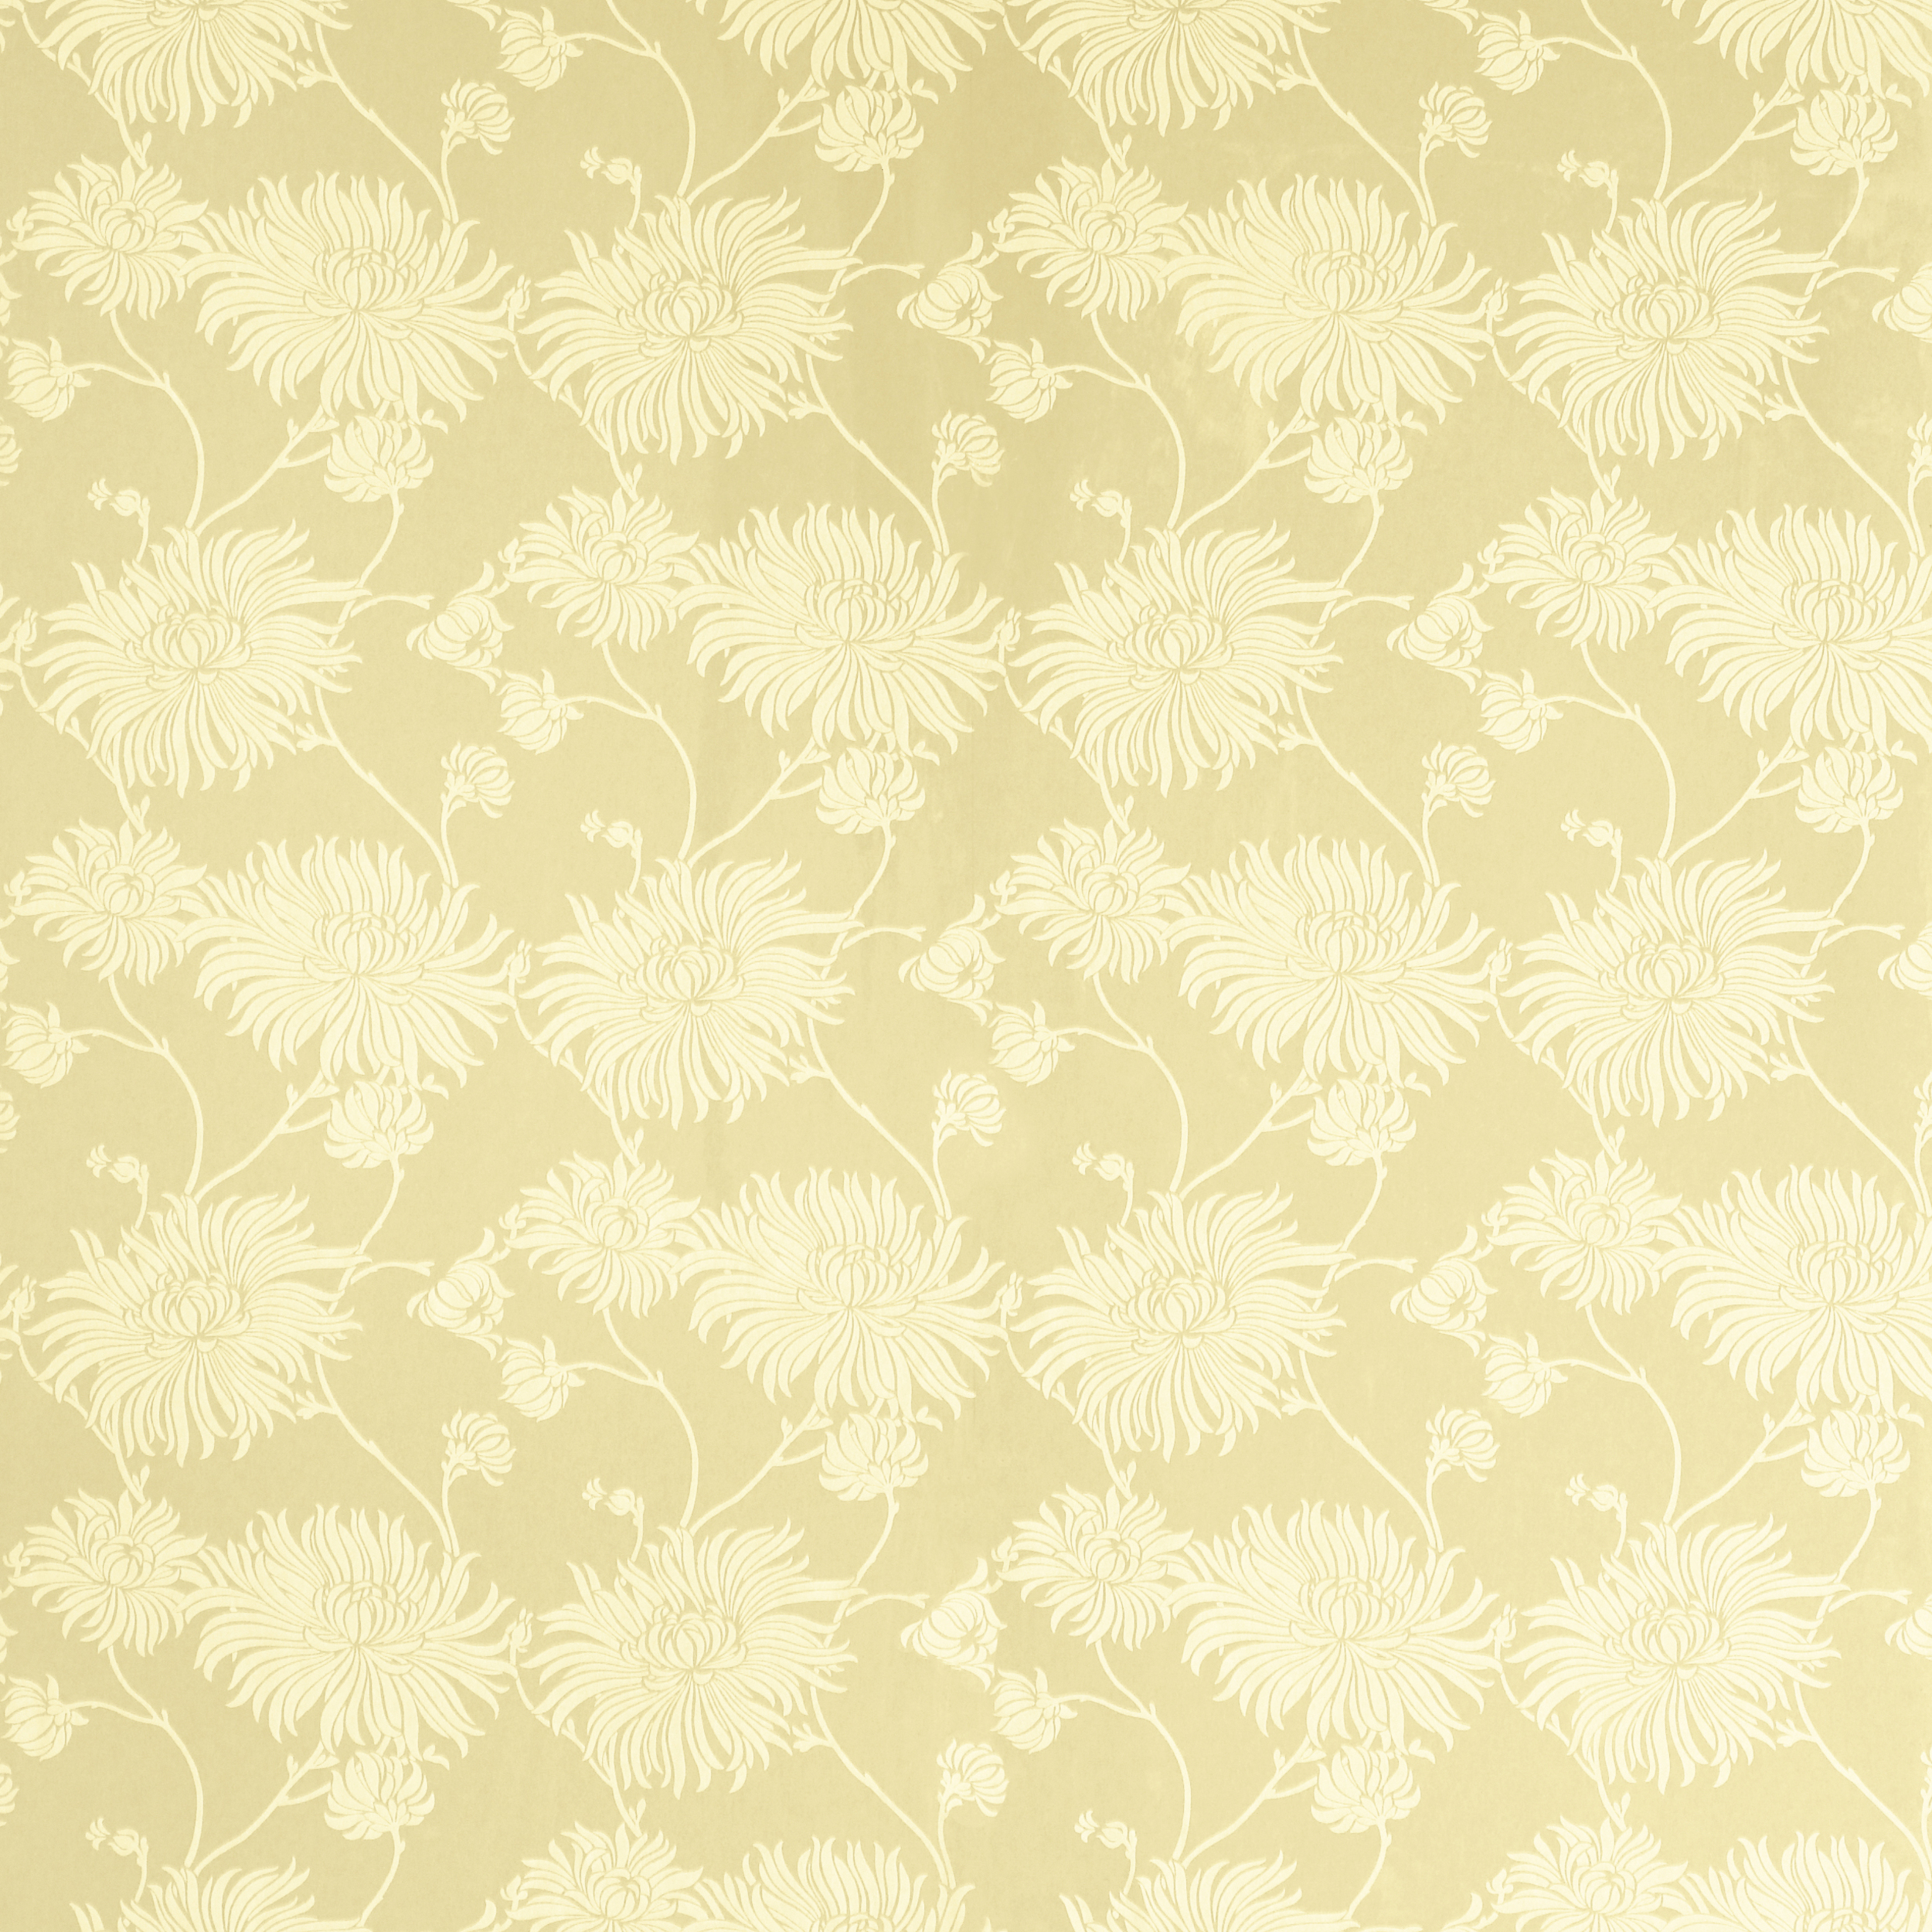 Home Decorating Wallpaper Kimono Gold Floral Wallpaper 2500x2500